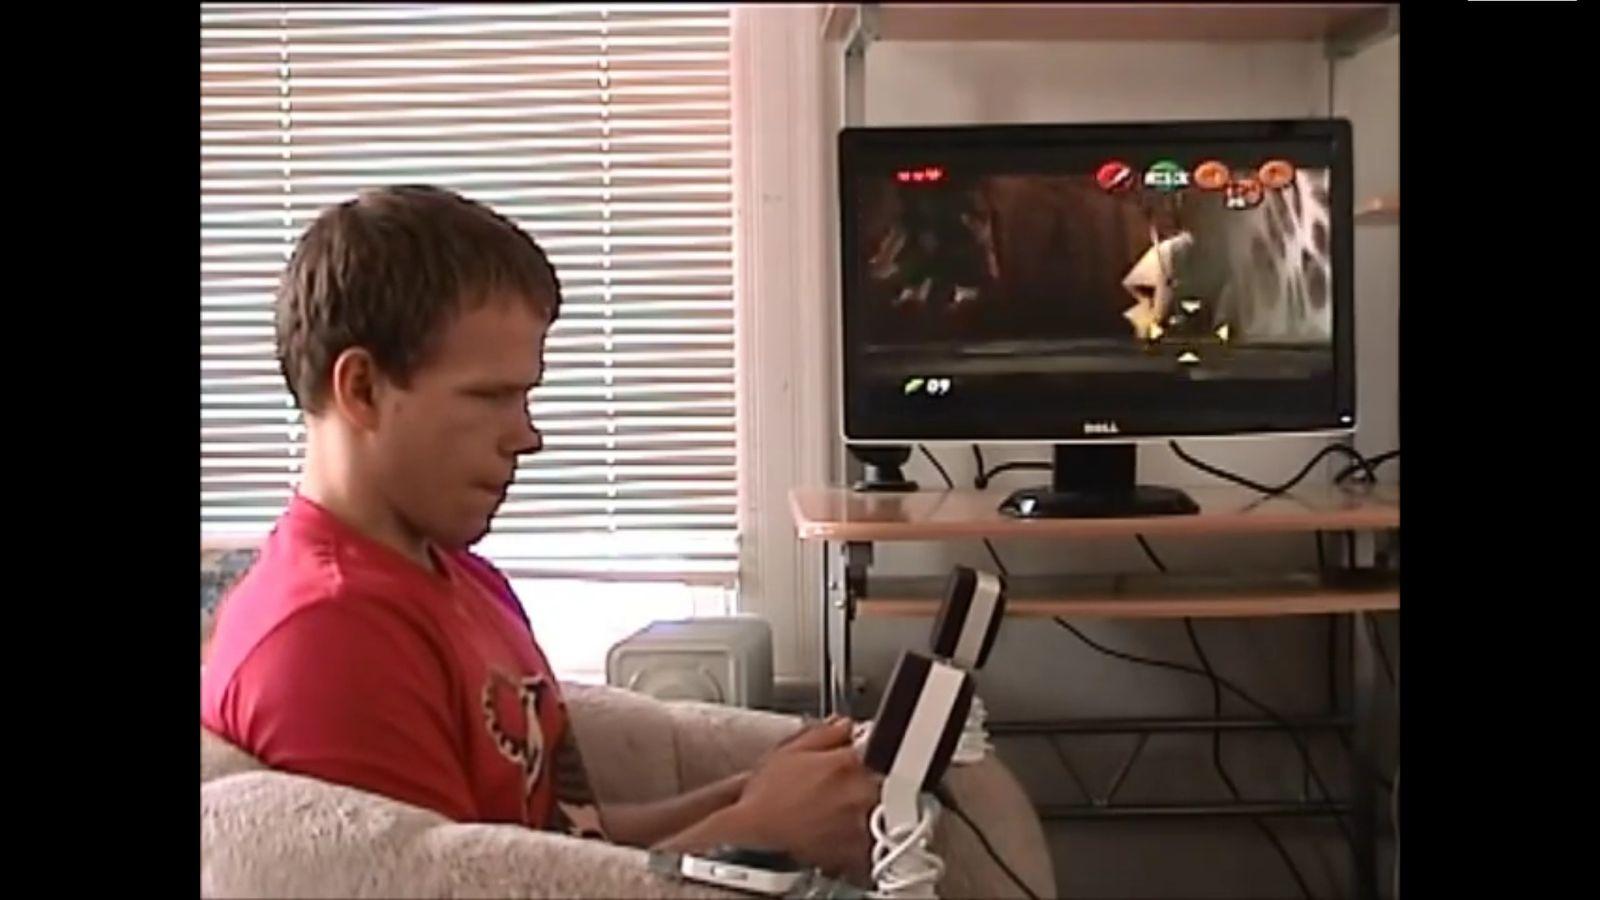 NUR ALS ZITAT Screenshot Blinder spielt Zelda/ YouTube